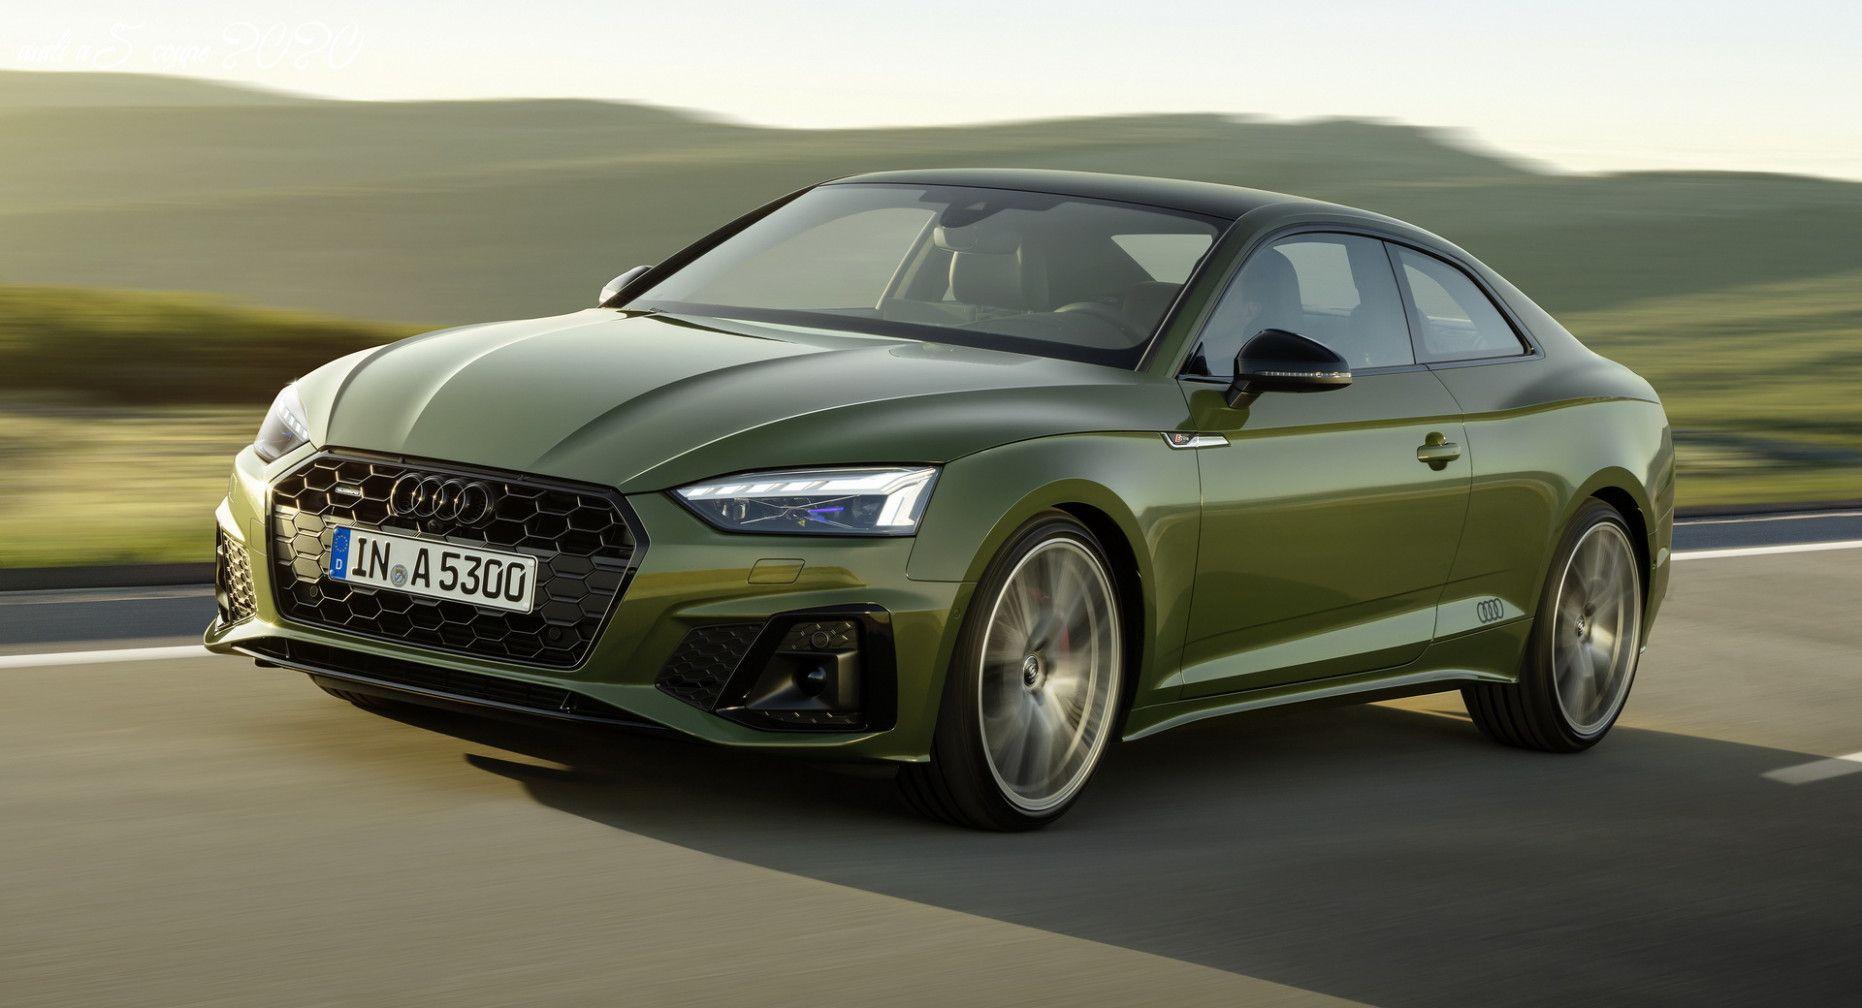 Audi A5 Coupe 2020 In 2020 Audi A5 Coupe A5 Coupe Audi A5